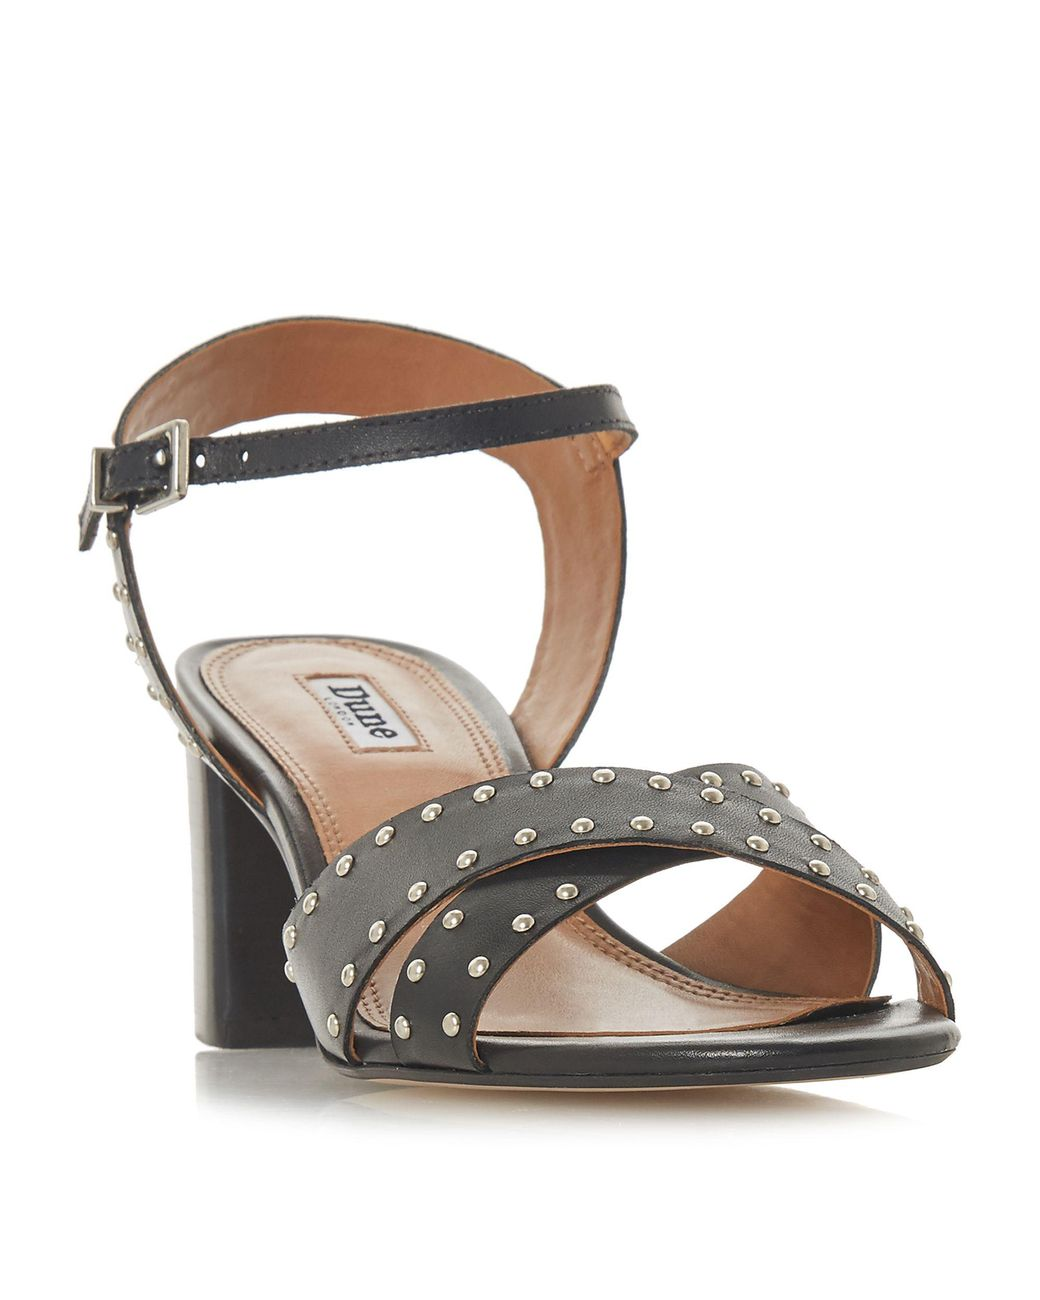 f626e02a514 Dune. Women s Black Leather  joyride  Mid Block Heel Ankle Strap Sandals